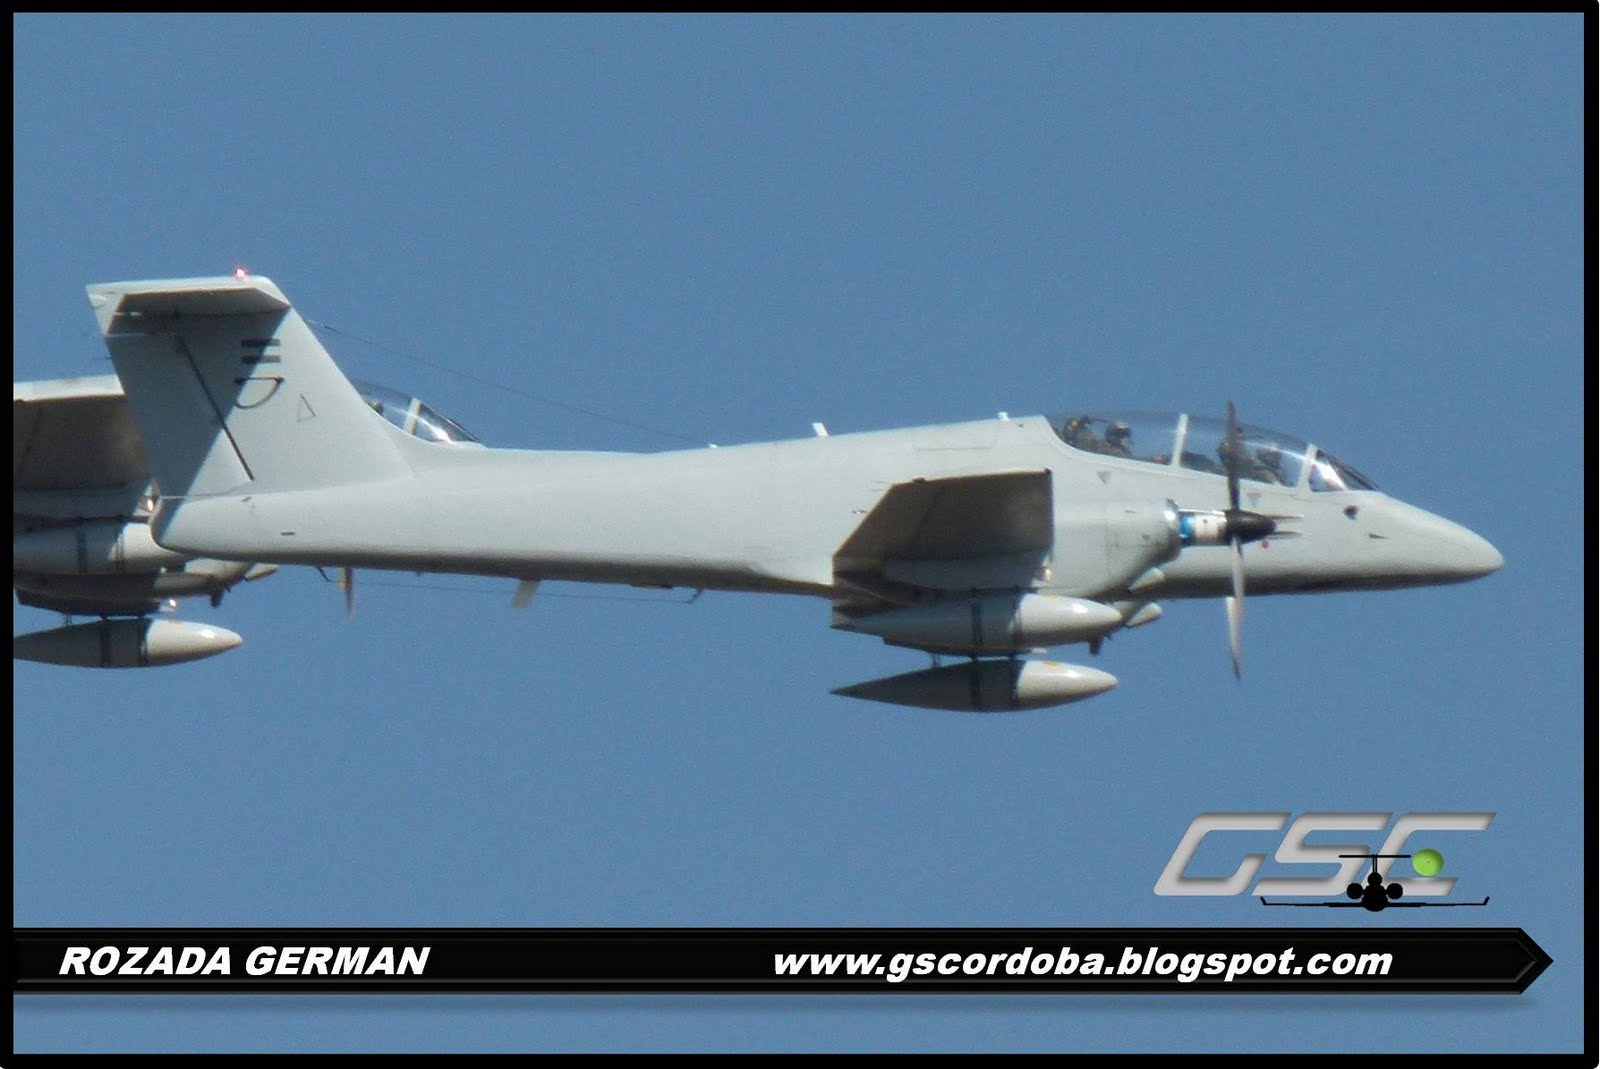 Imagenes Dia de la Fuerza Aerea Argentina